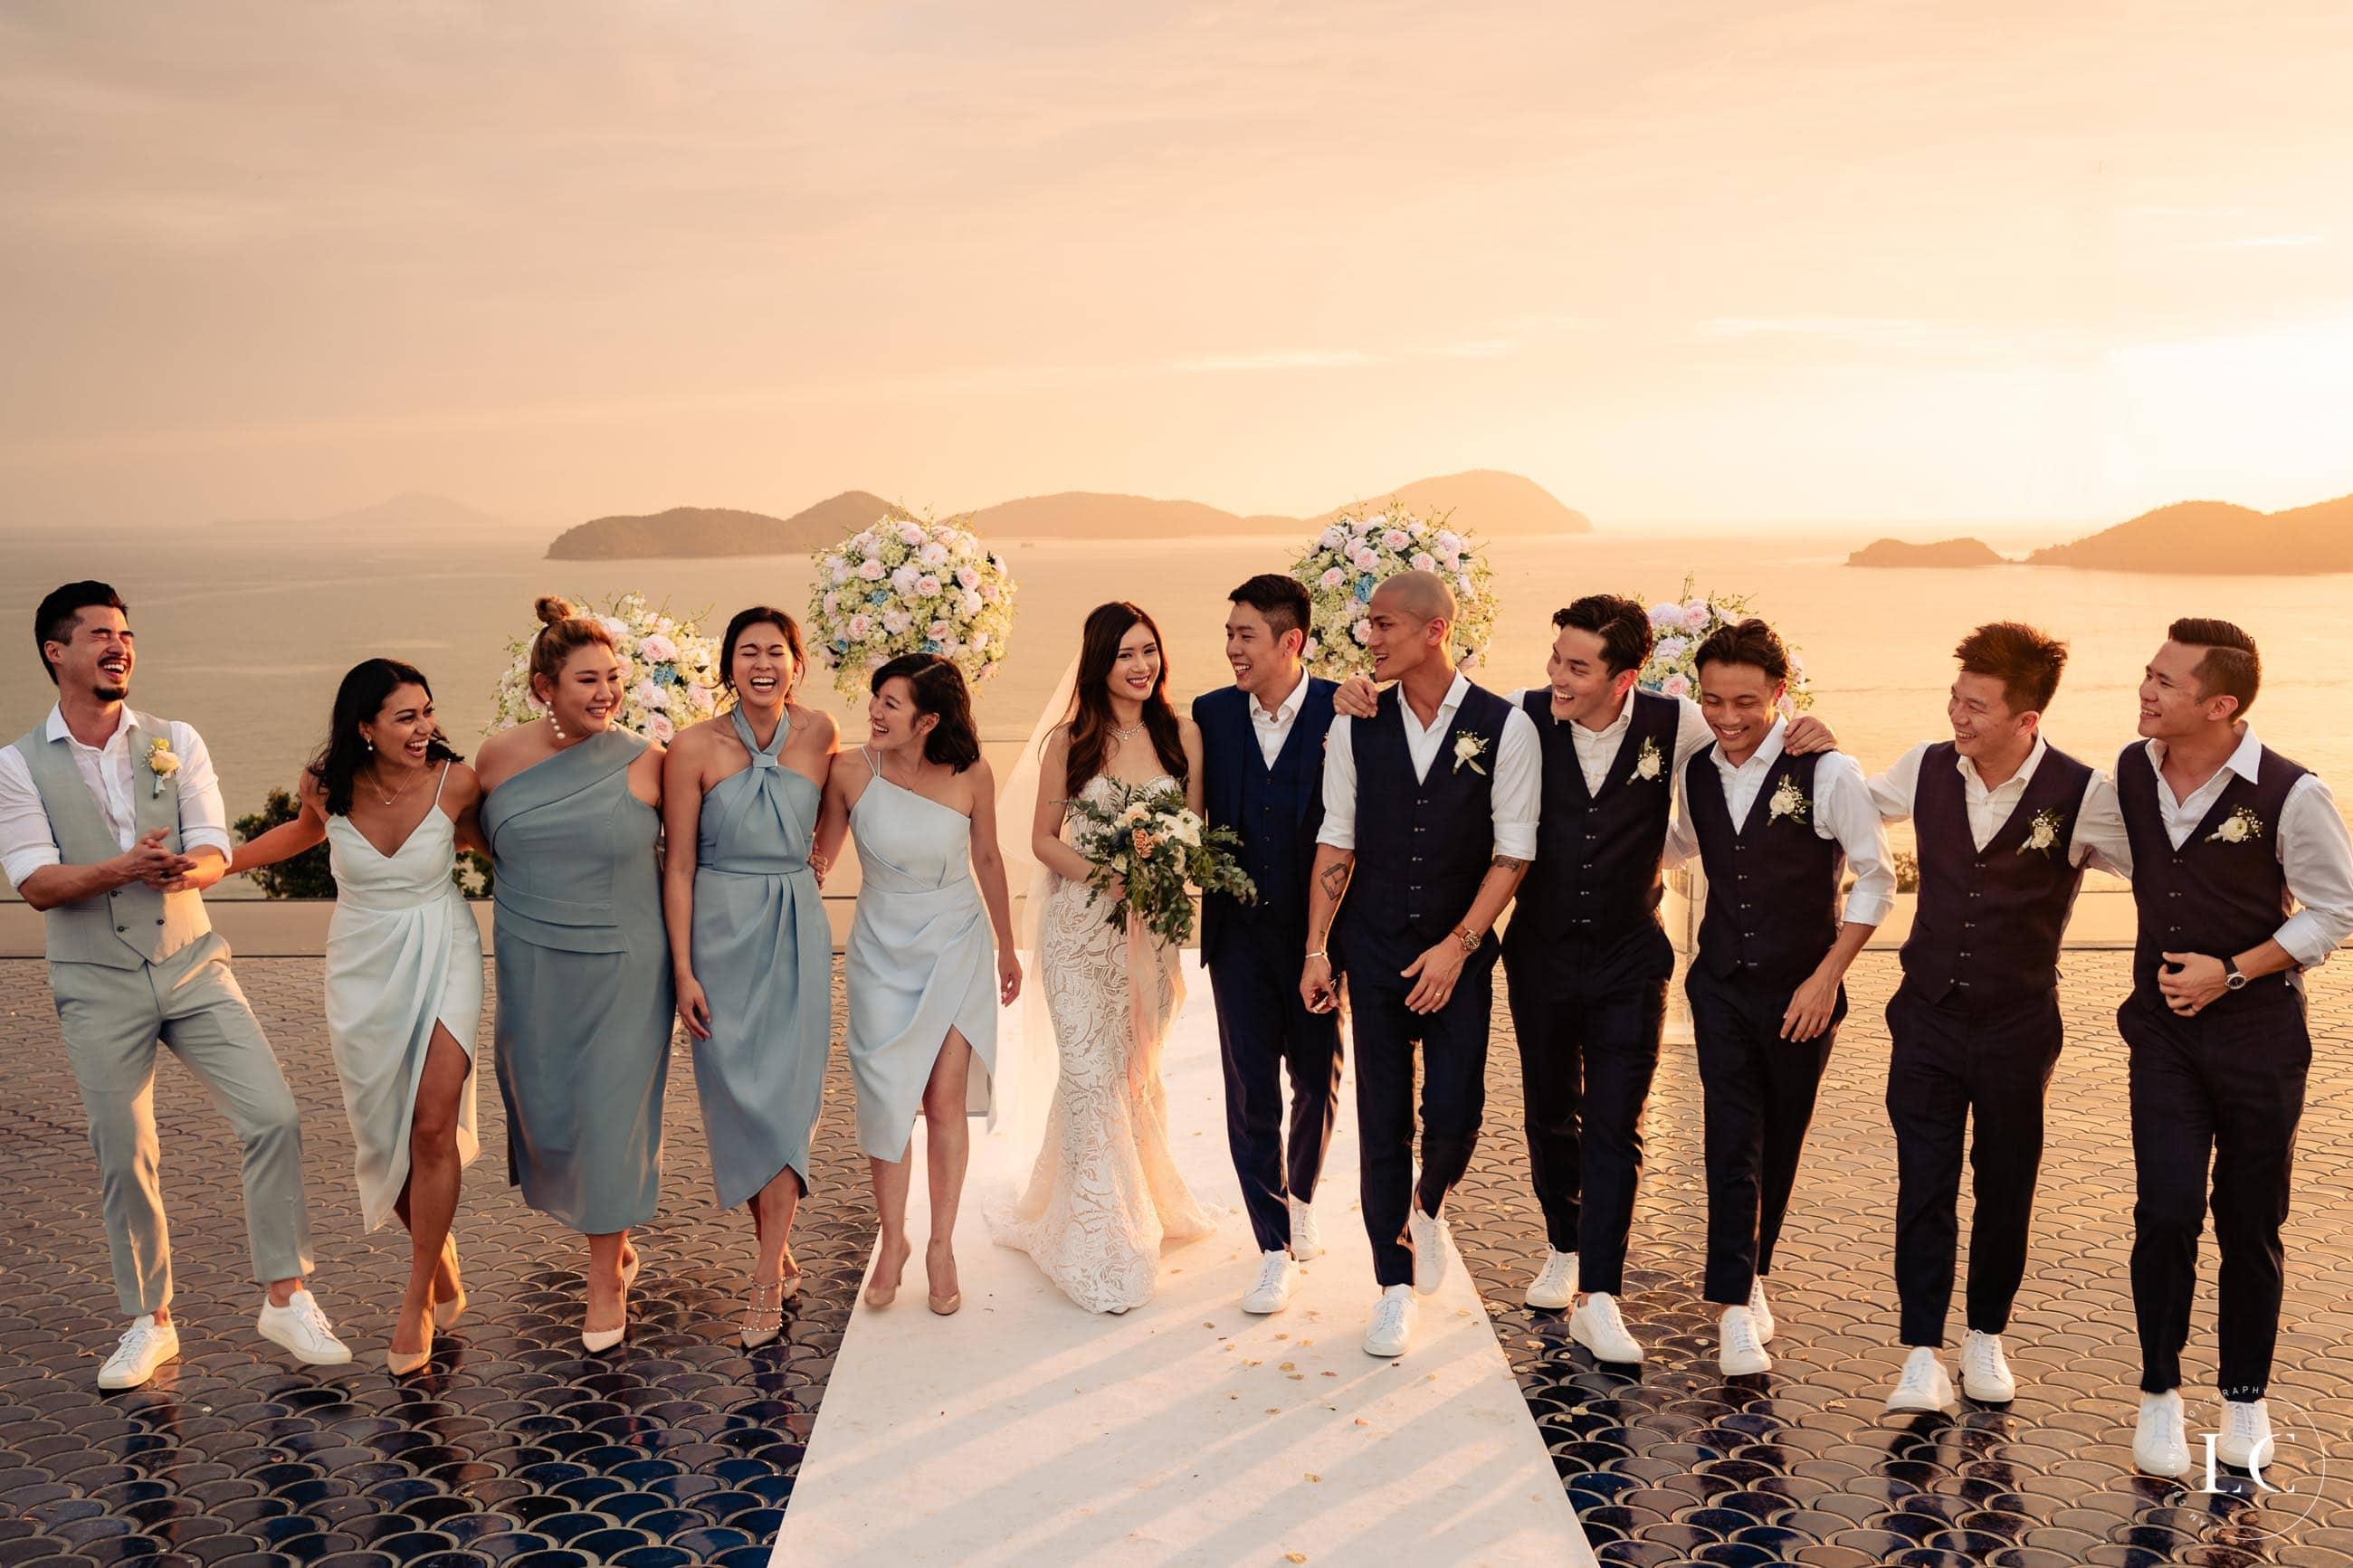 Bridesmaids and groomsmen walking